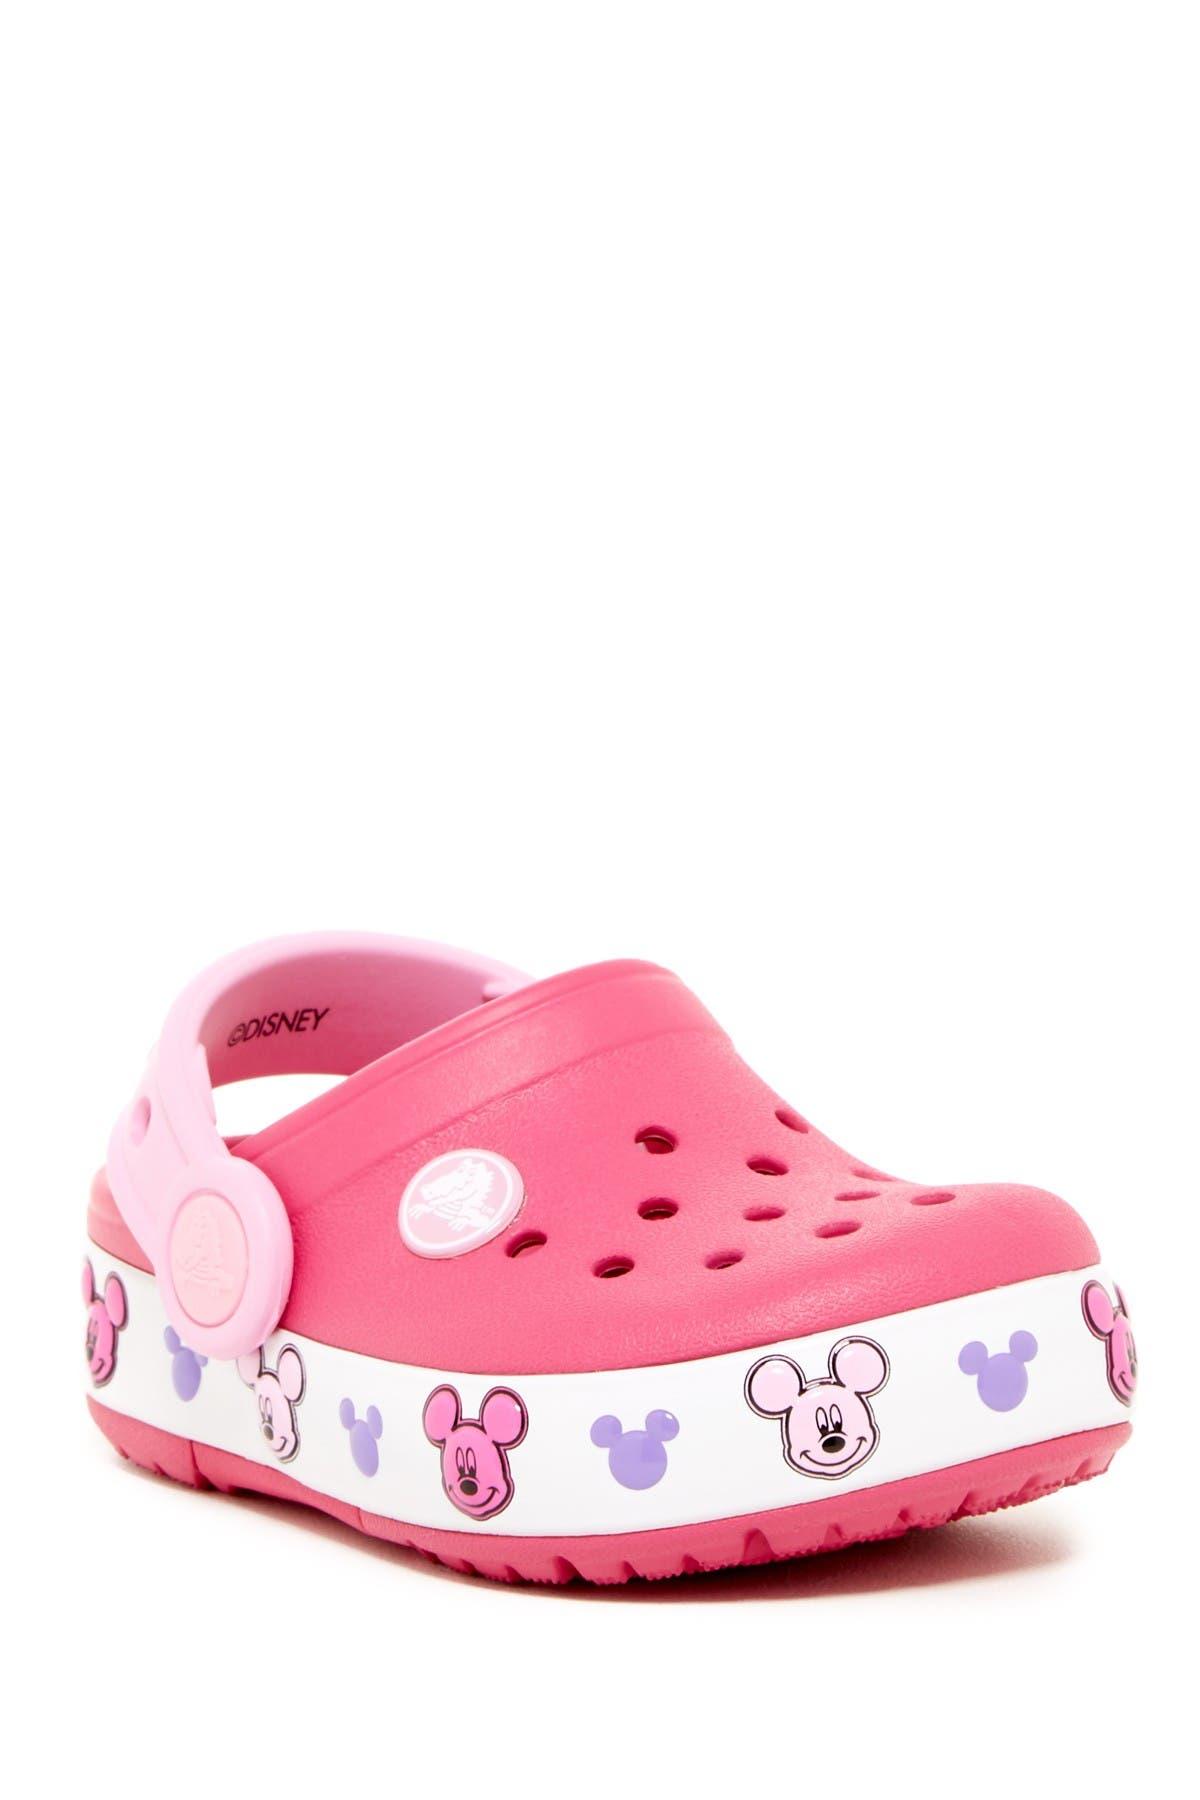 Crocs | Lights Mickey Light-Up Clog